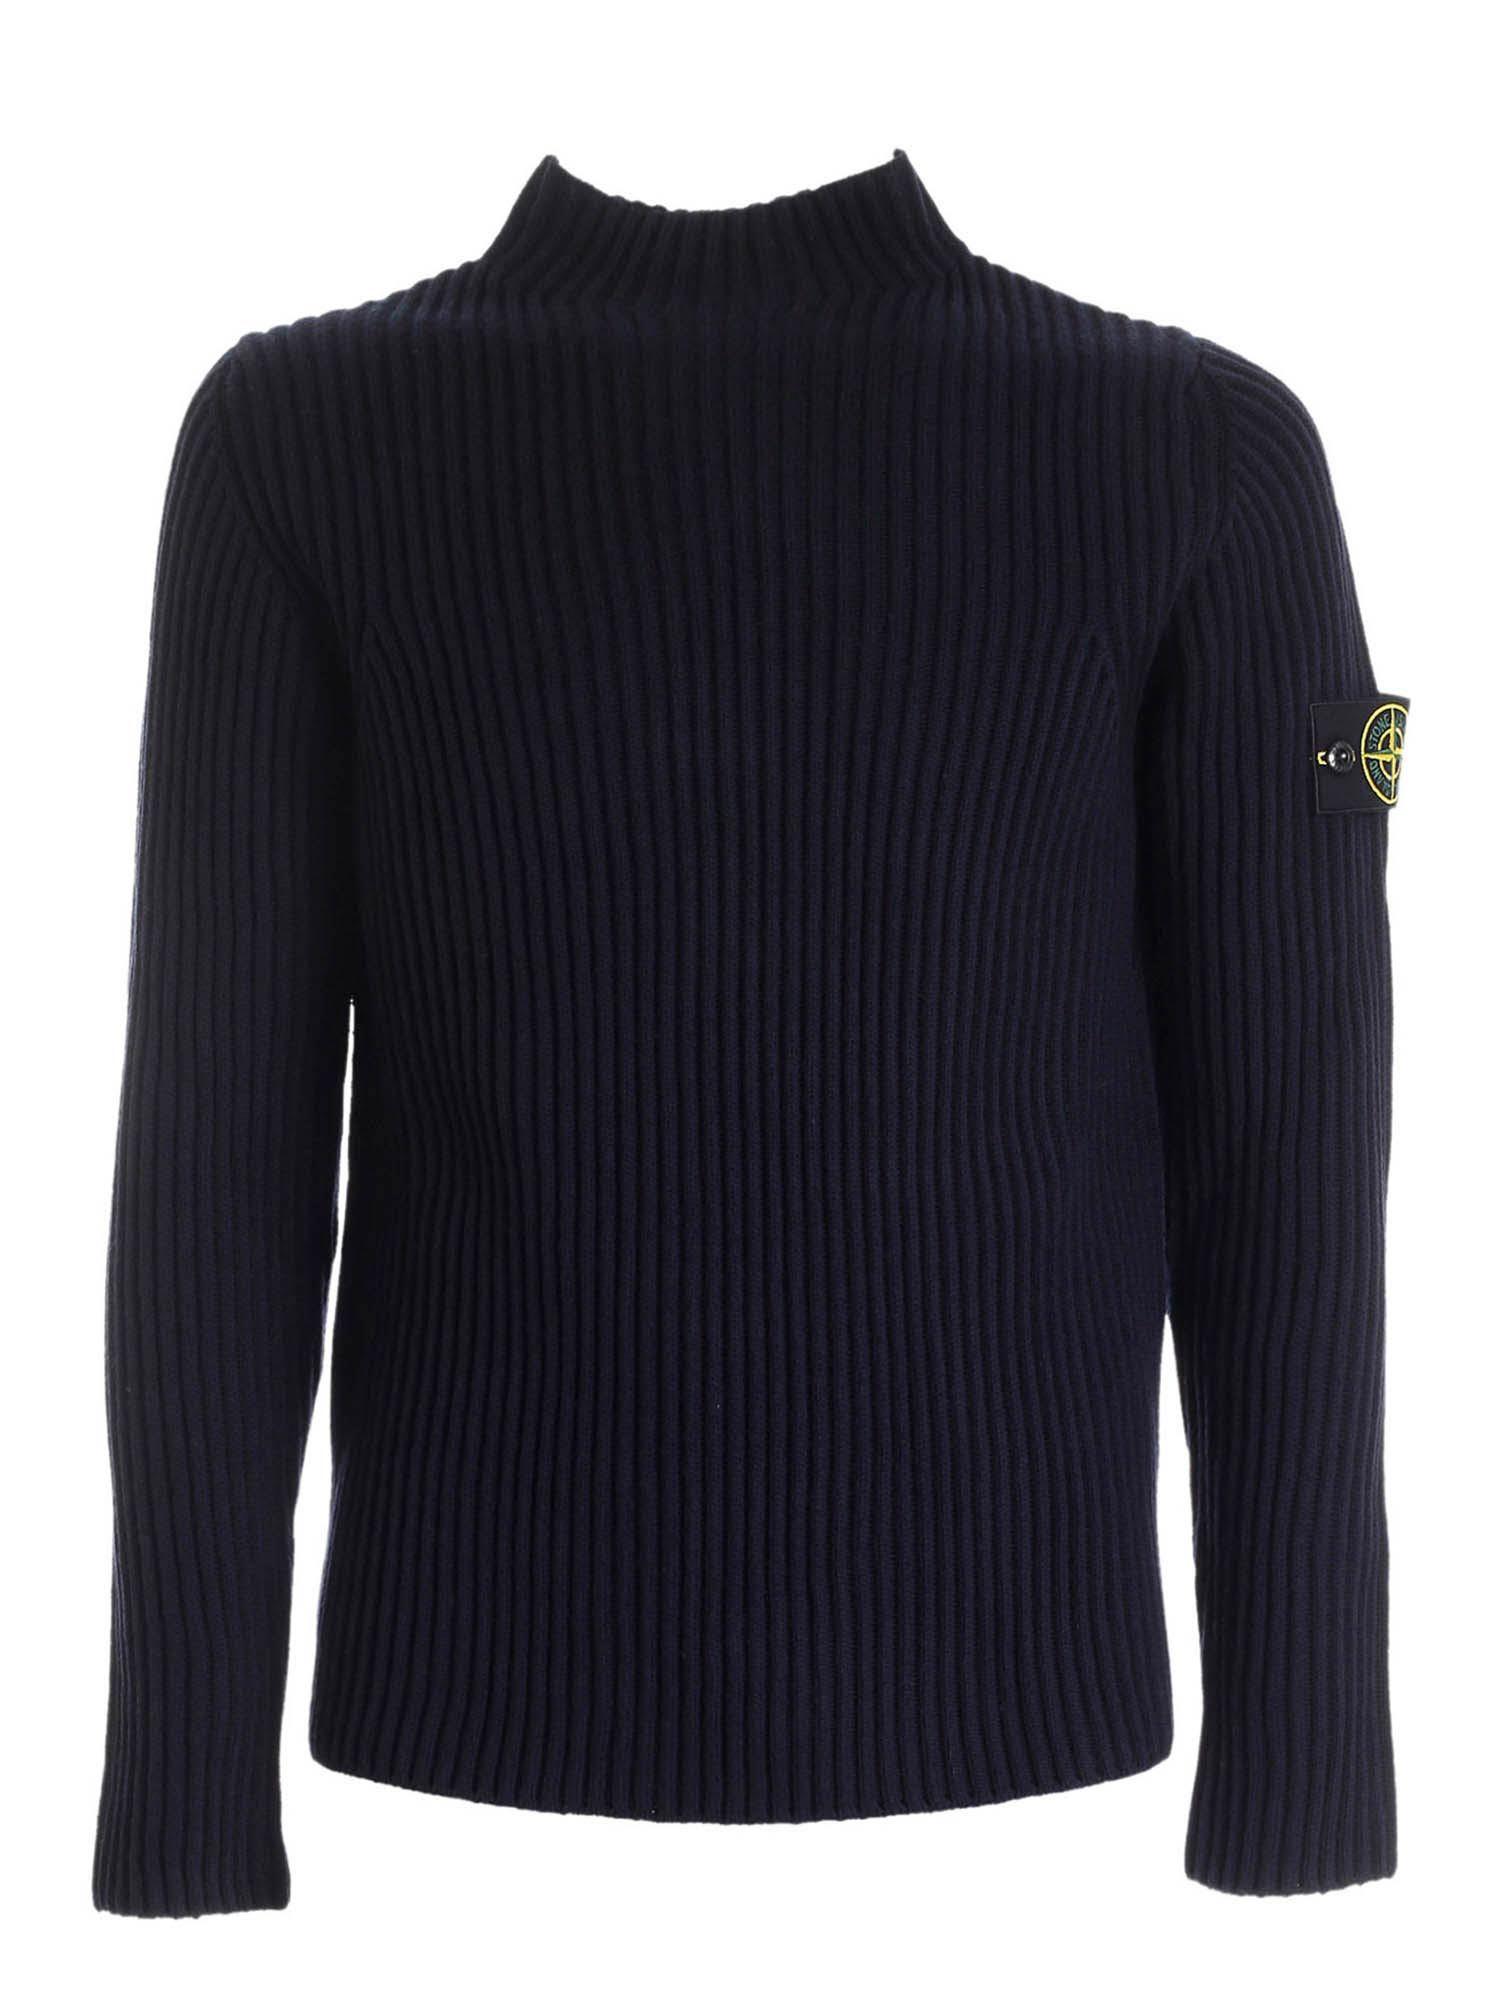 Stone Island Sweaters RIBBED HIGH COLLAR SWEATER